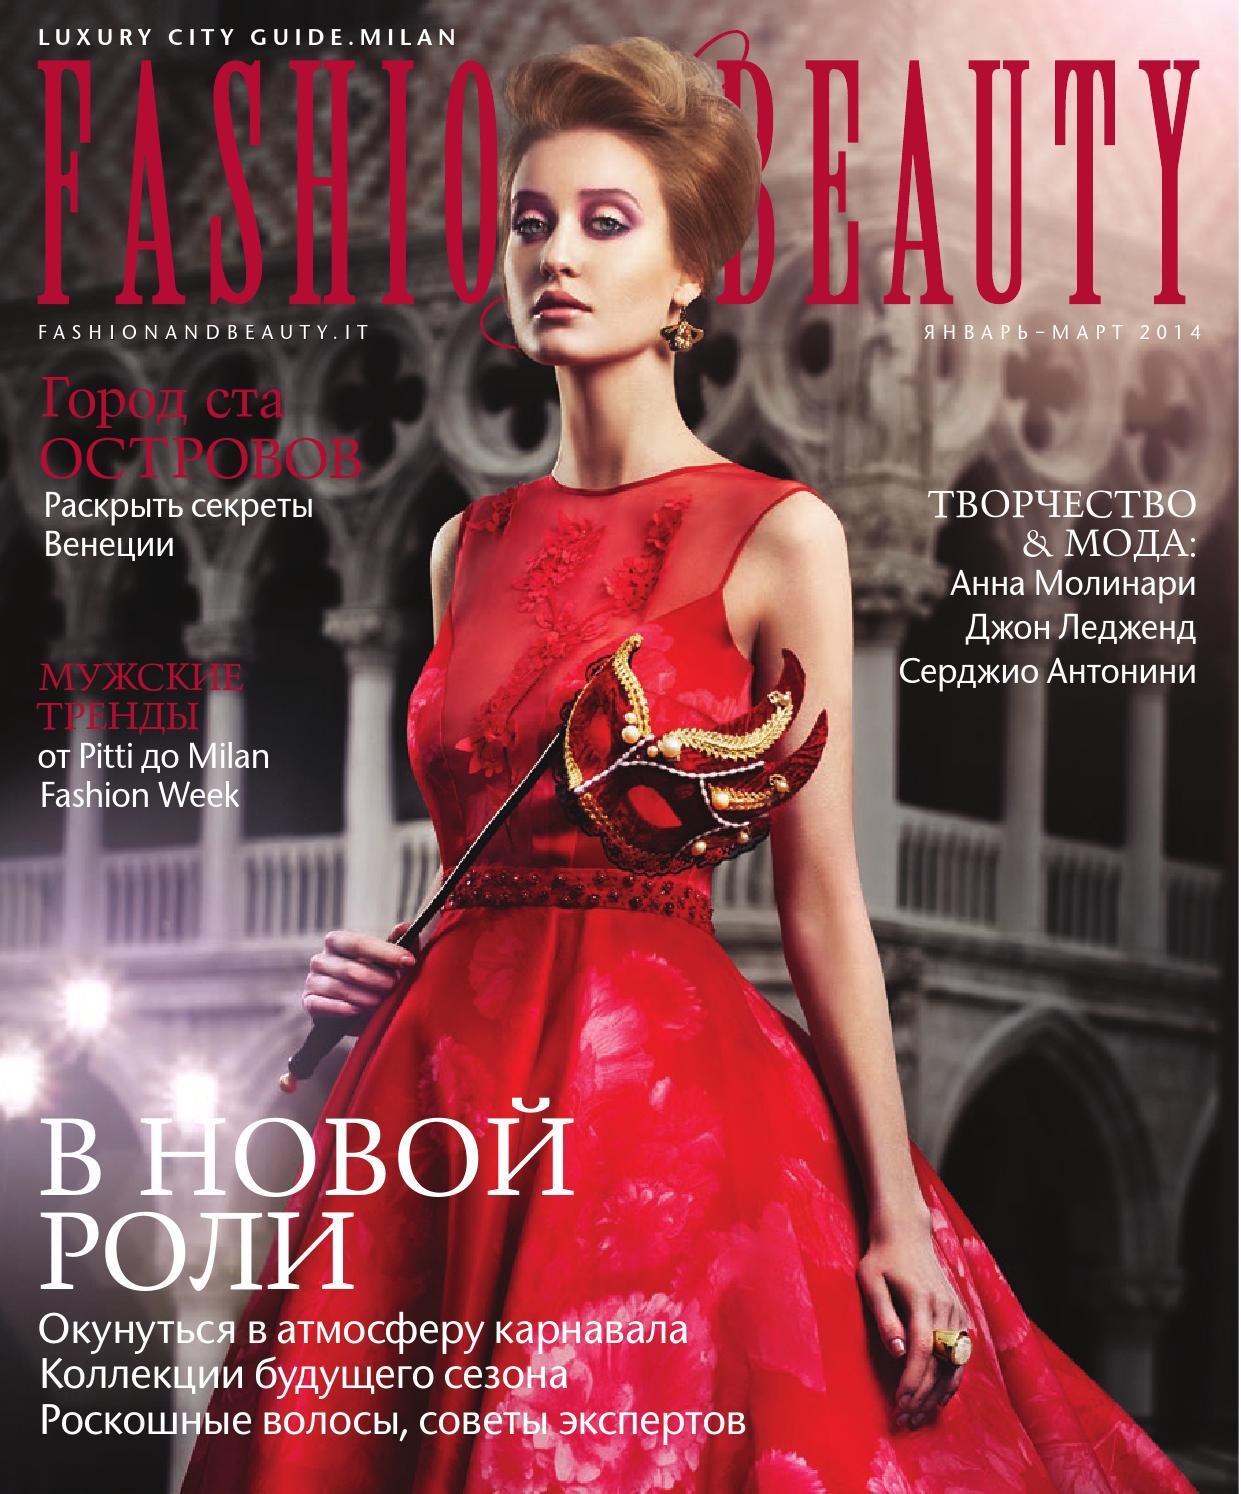 Fake Beauty Review How to Spot One  thecutcom